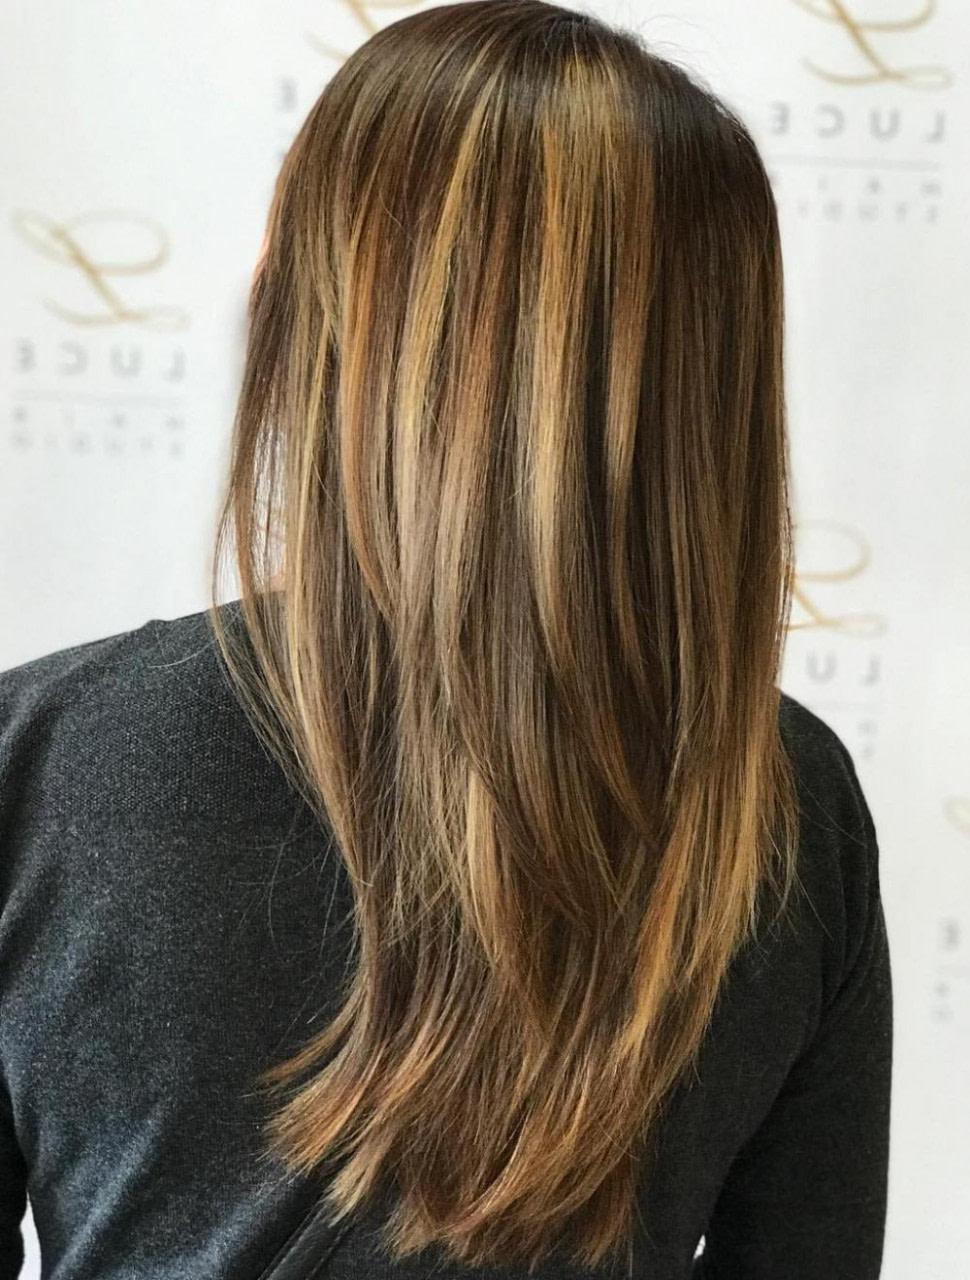 genial frisur dünne lange haare - männer frisuren trend